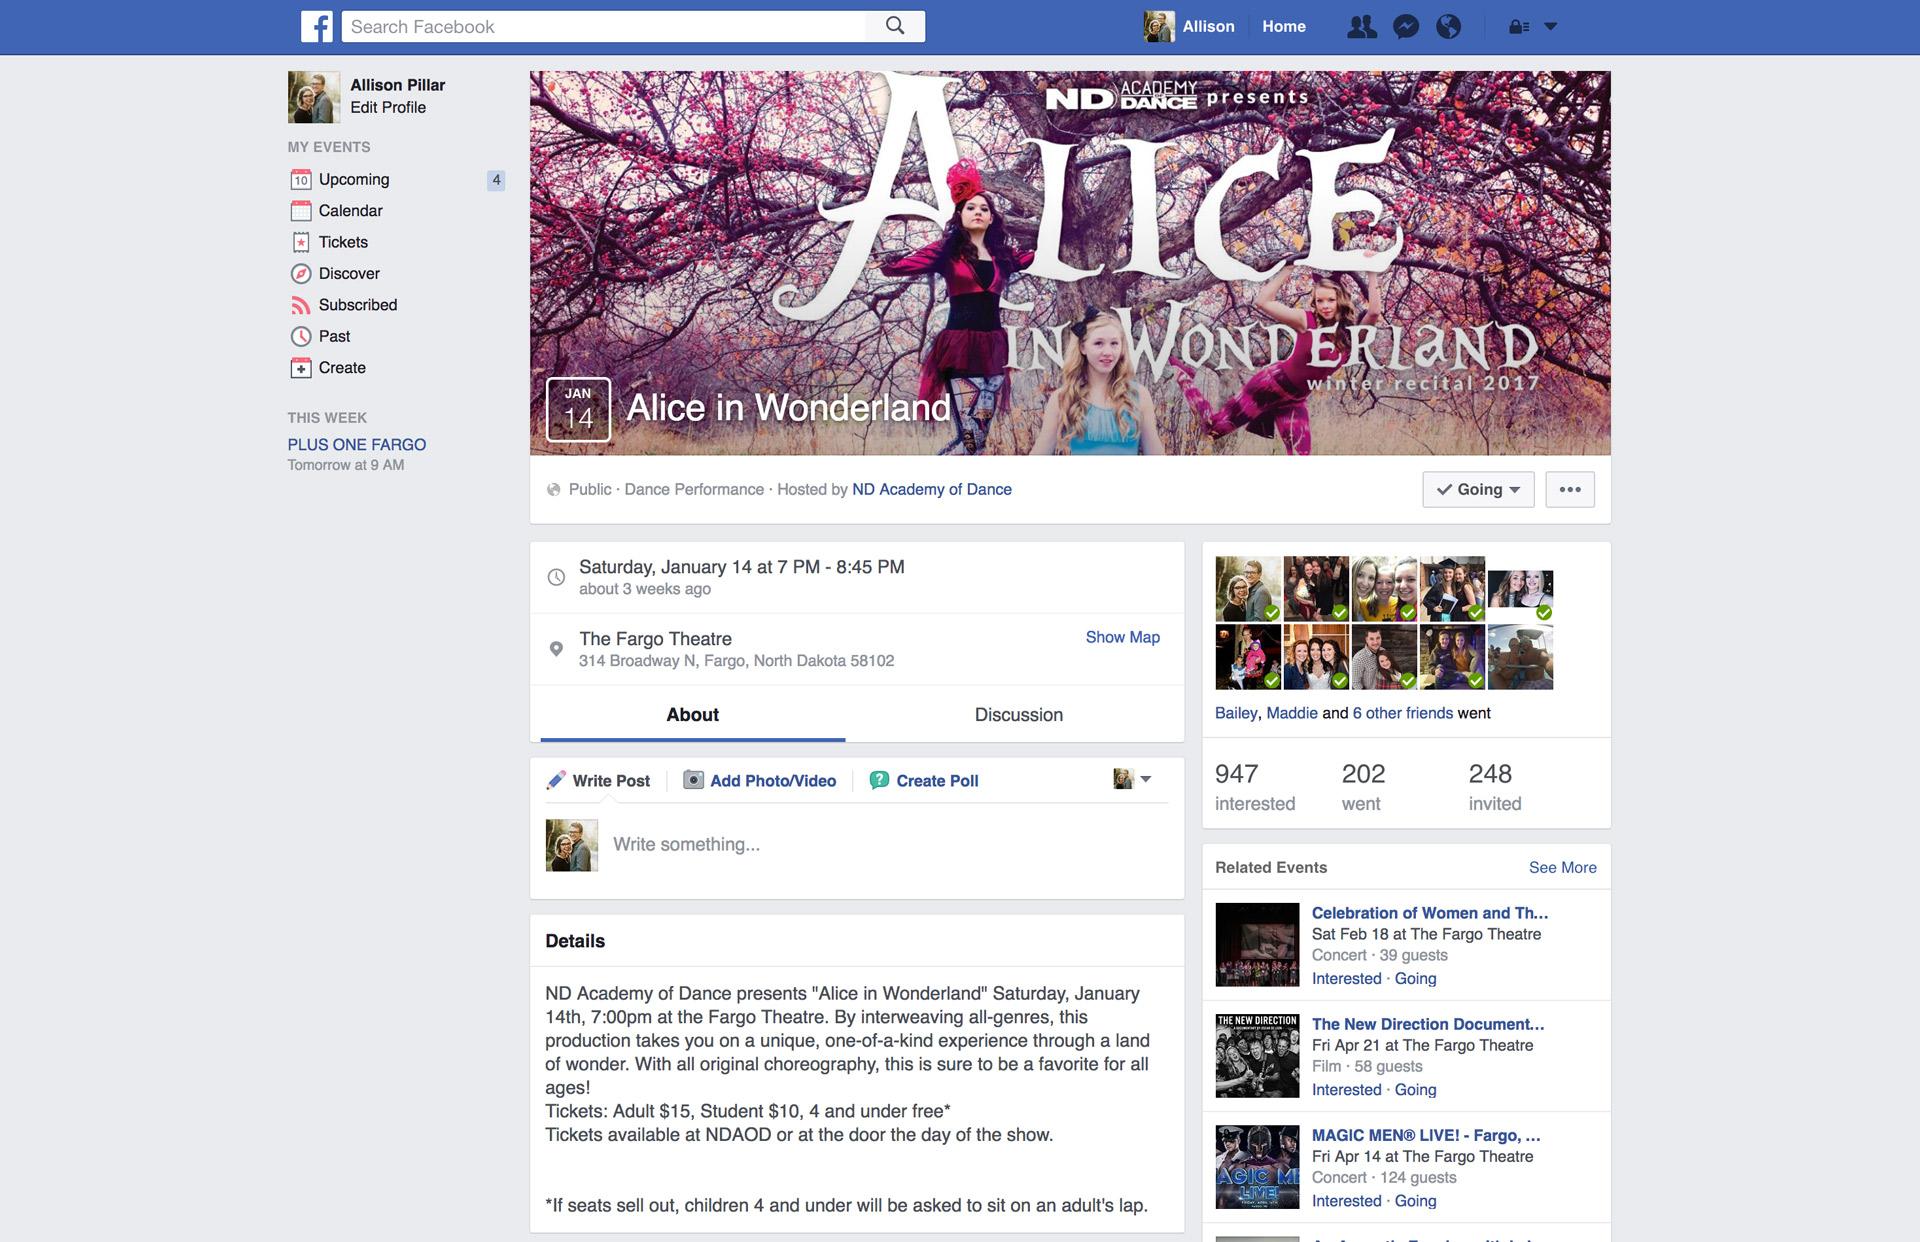 Screen capture of Alice in Wonderland Facebook event page